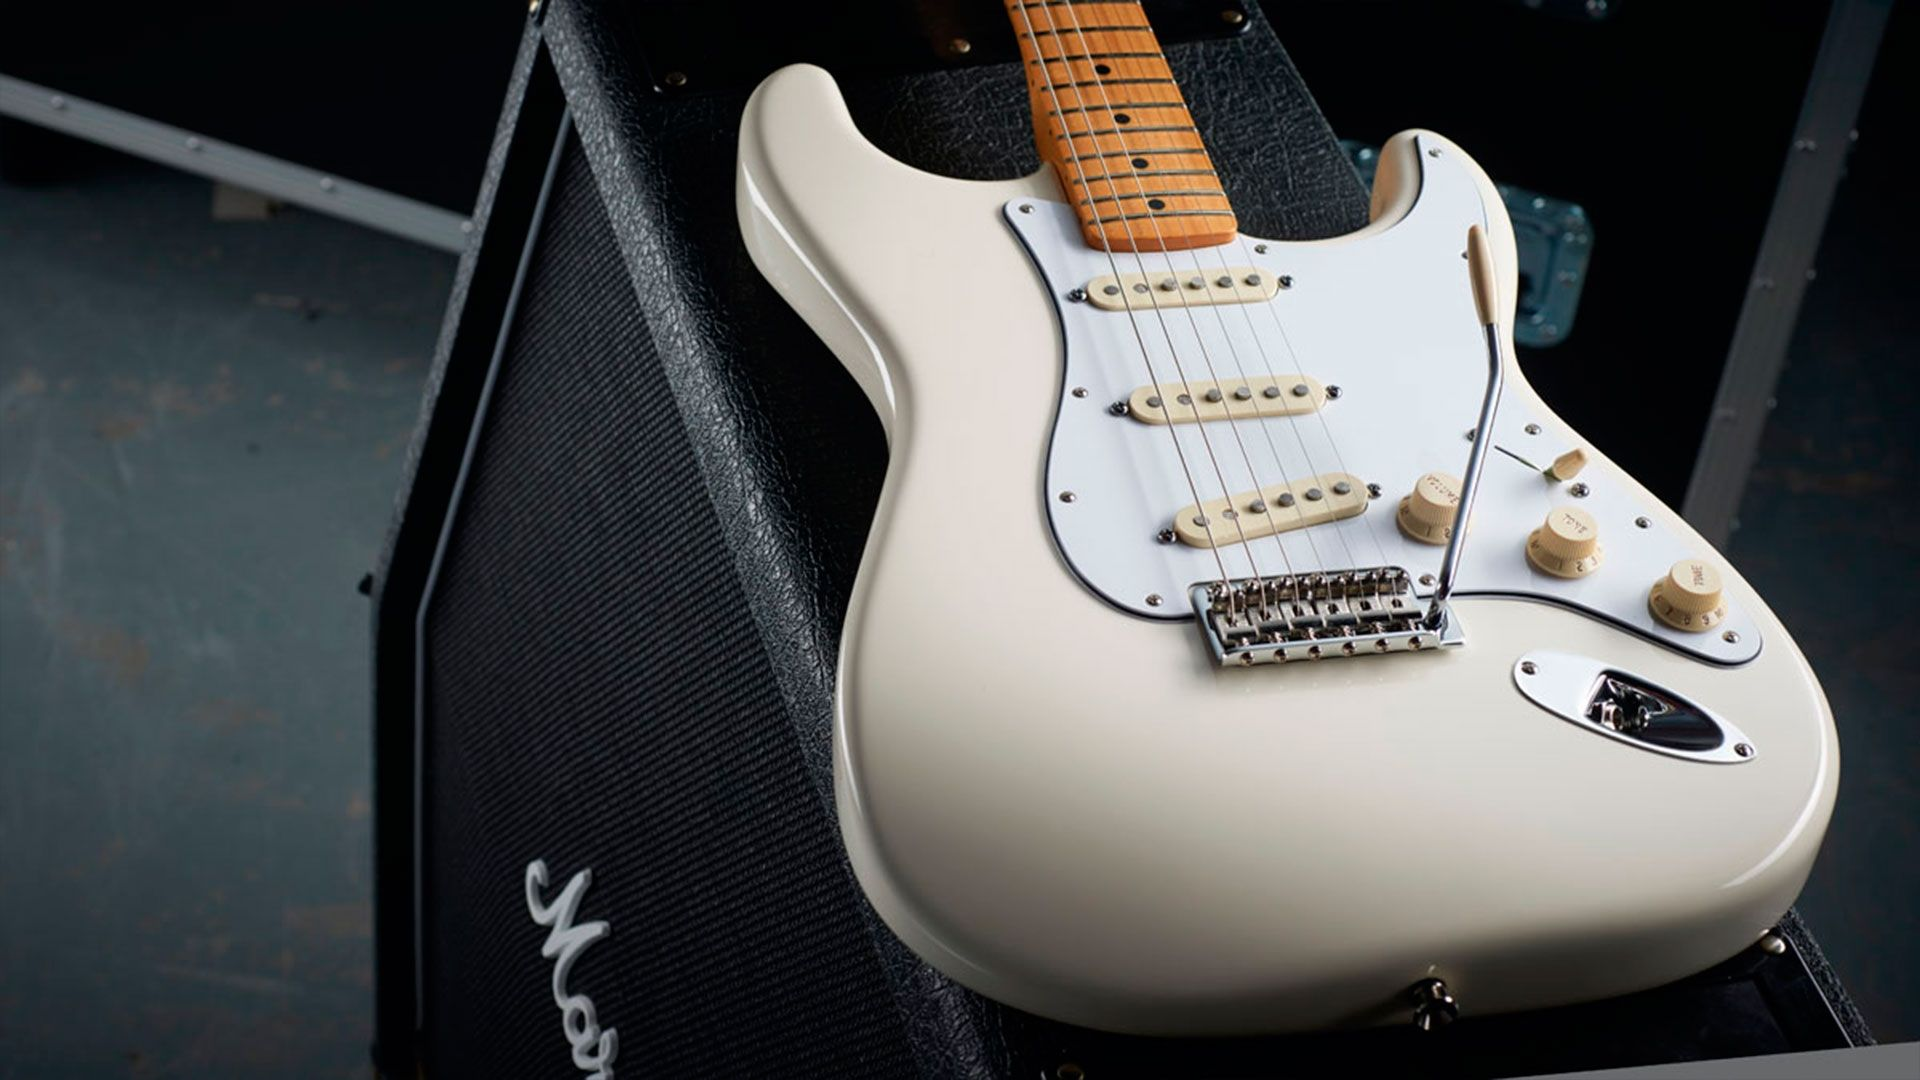 Fender Guitar, HD Wallpaper